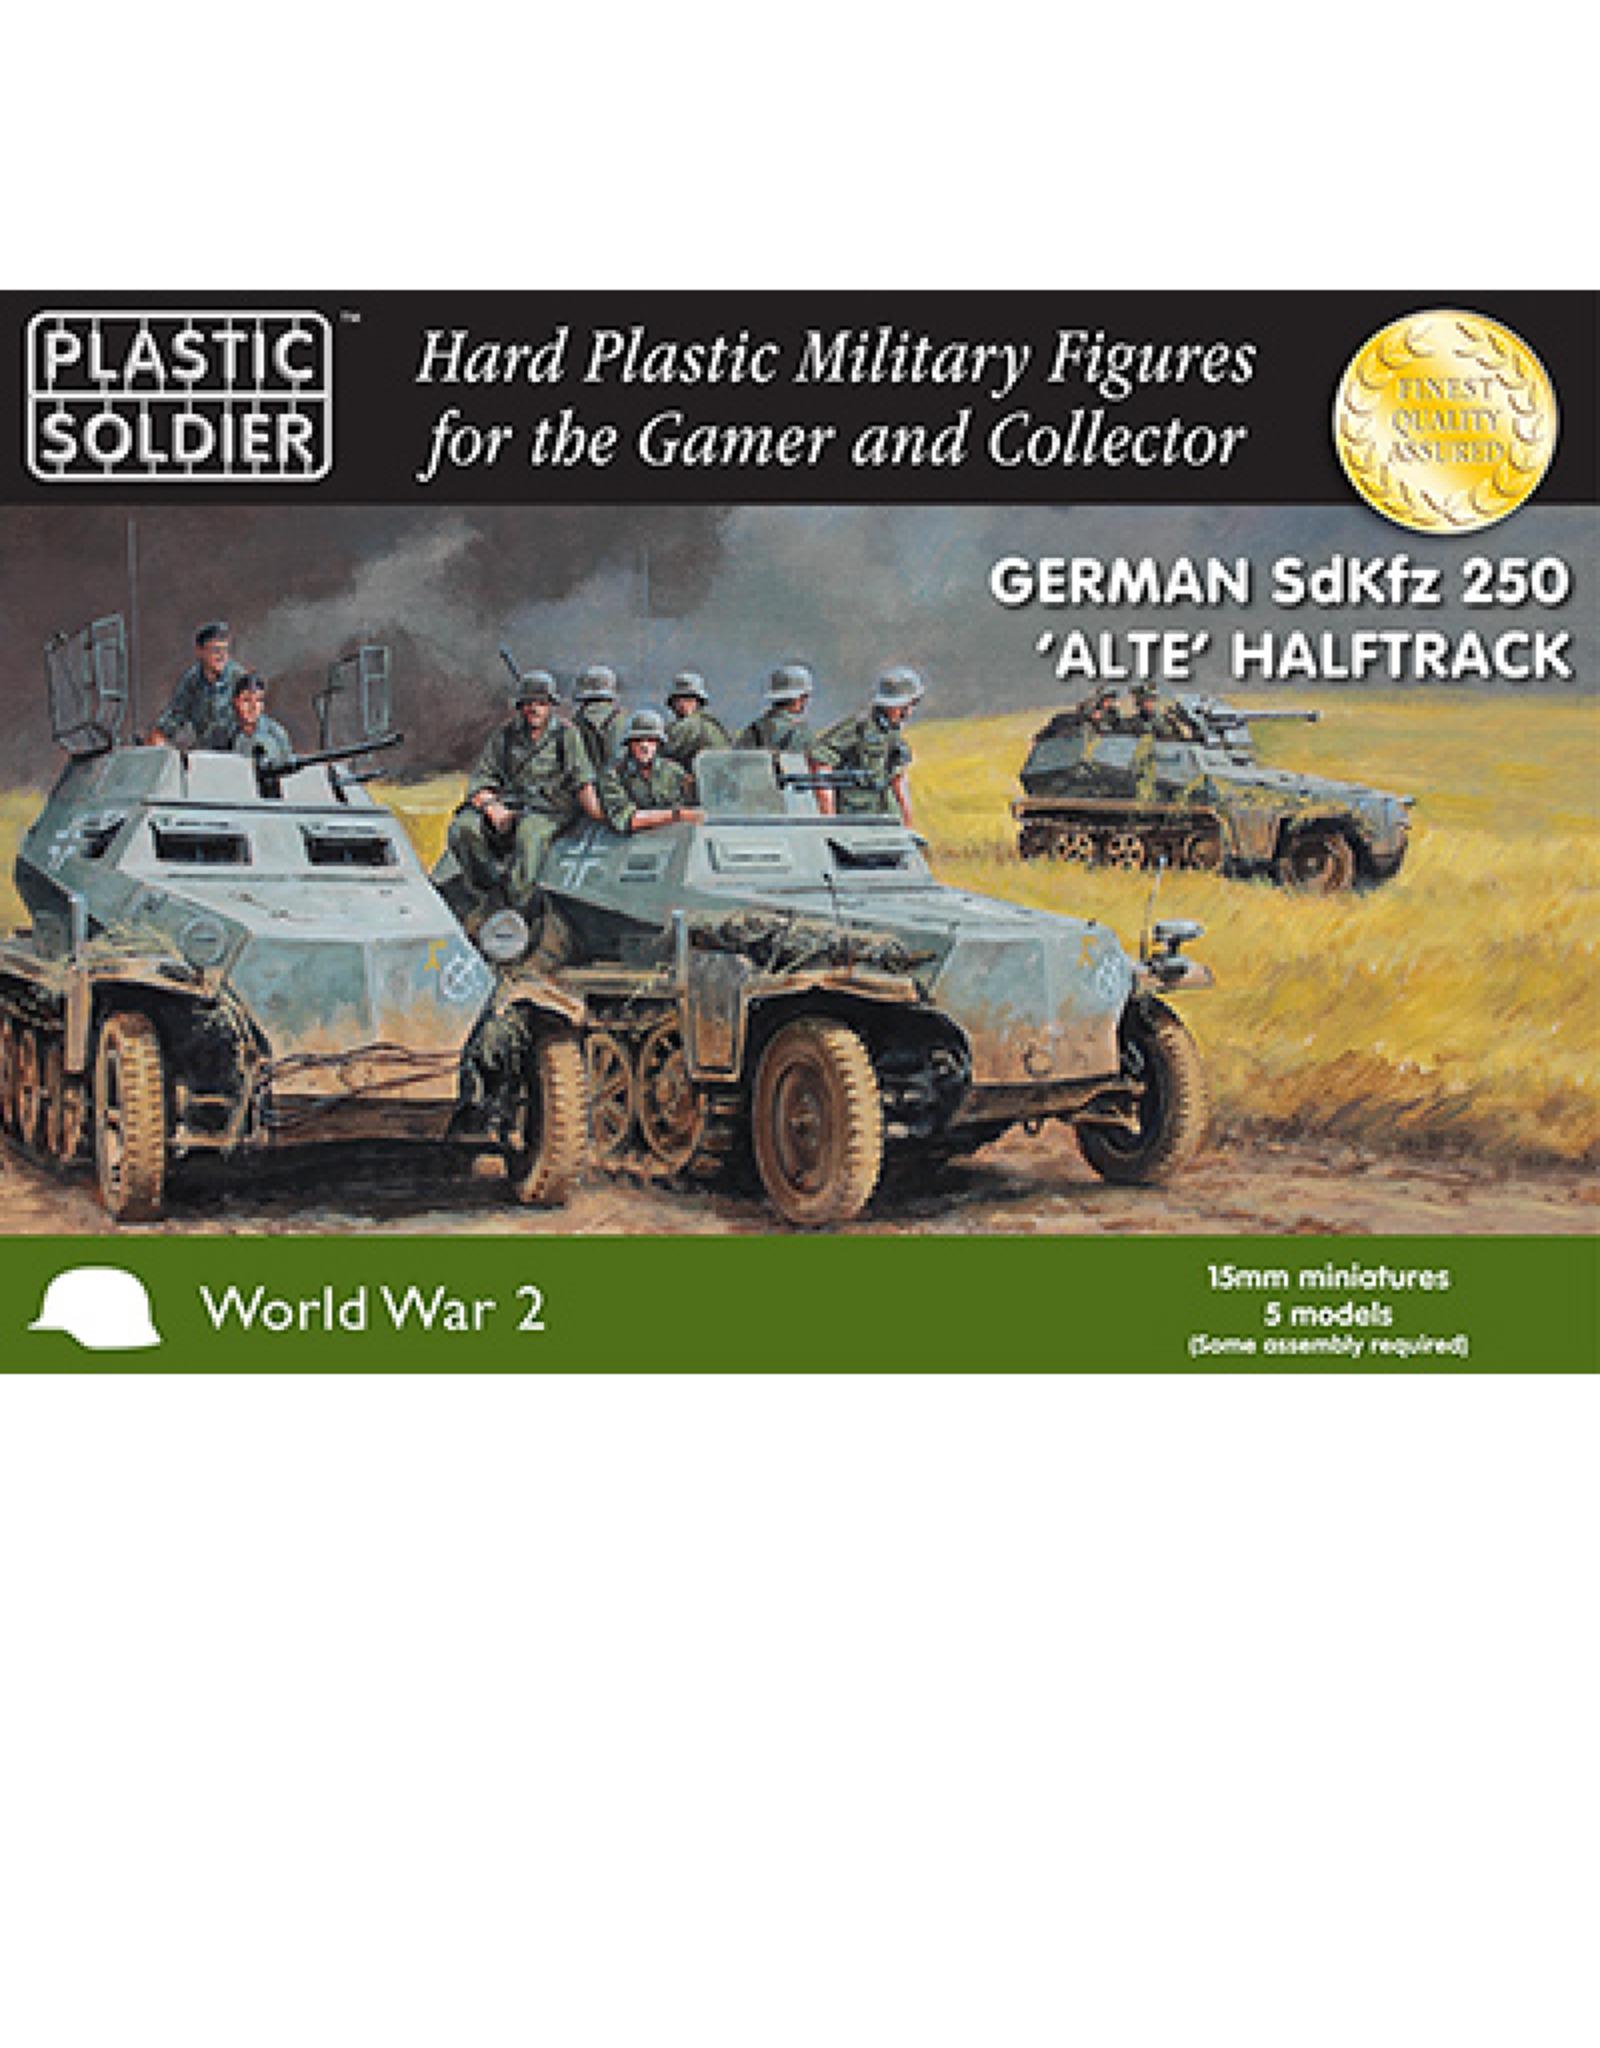 Plastic Soldier Company German SdKfz 250 alte halftrack